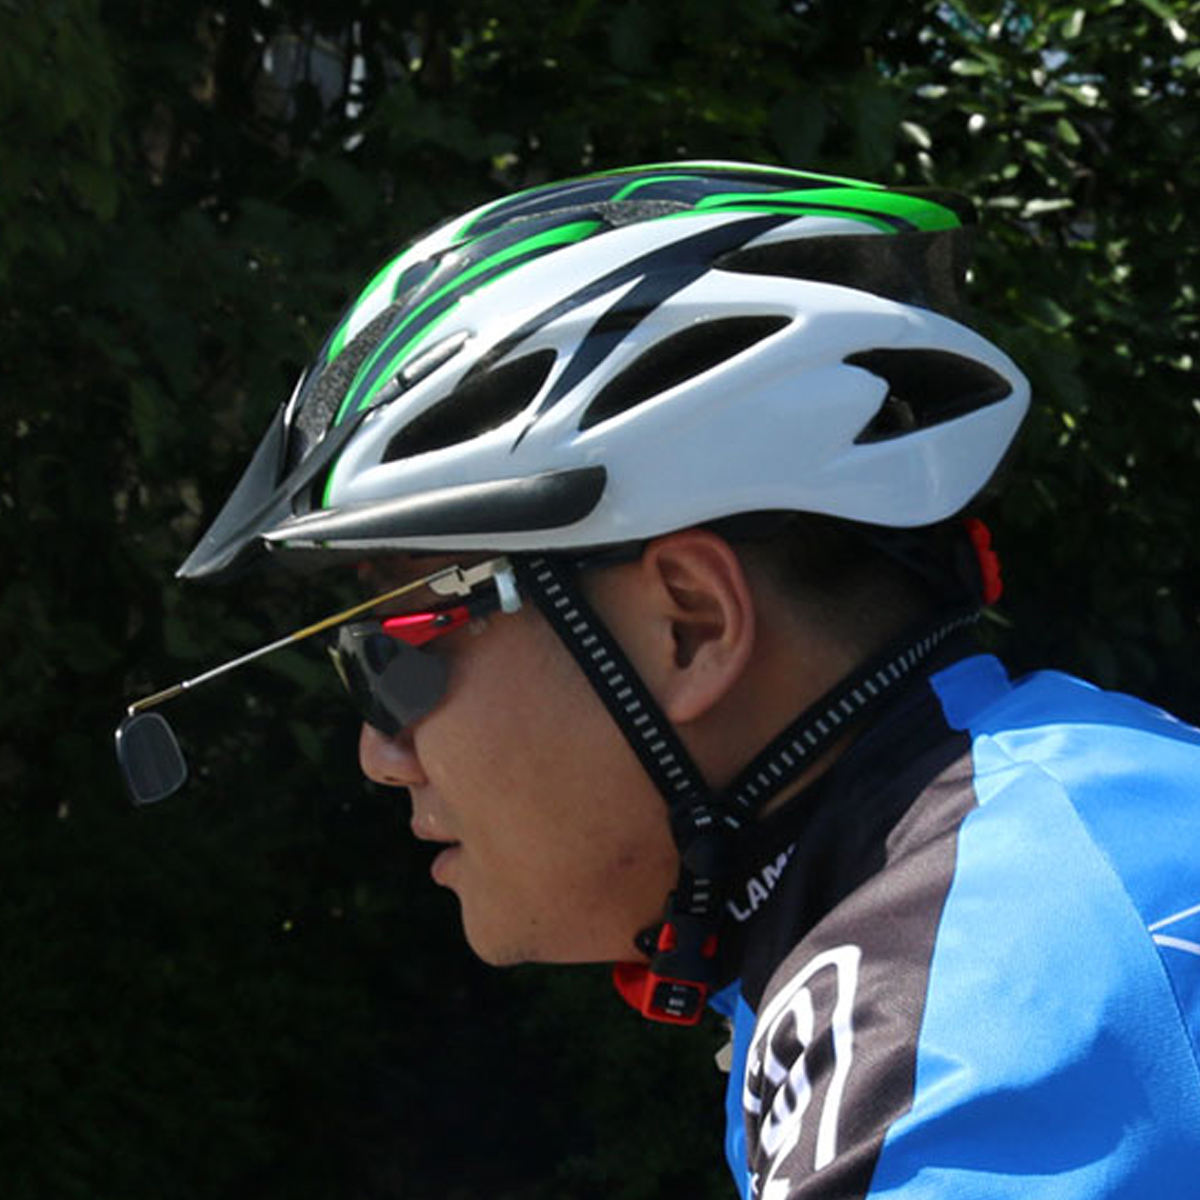 BIKIGHT Aluminum Alloy Lightweight 360 Degree Bike Helmet Mount Rear View Mirrors Adjustable